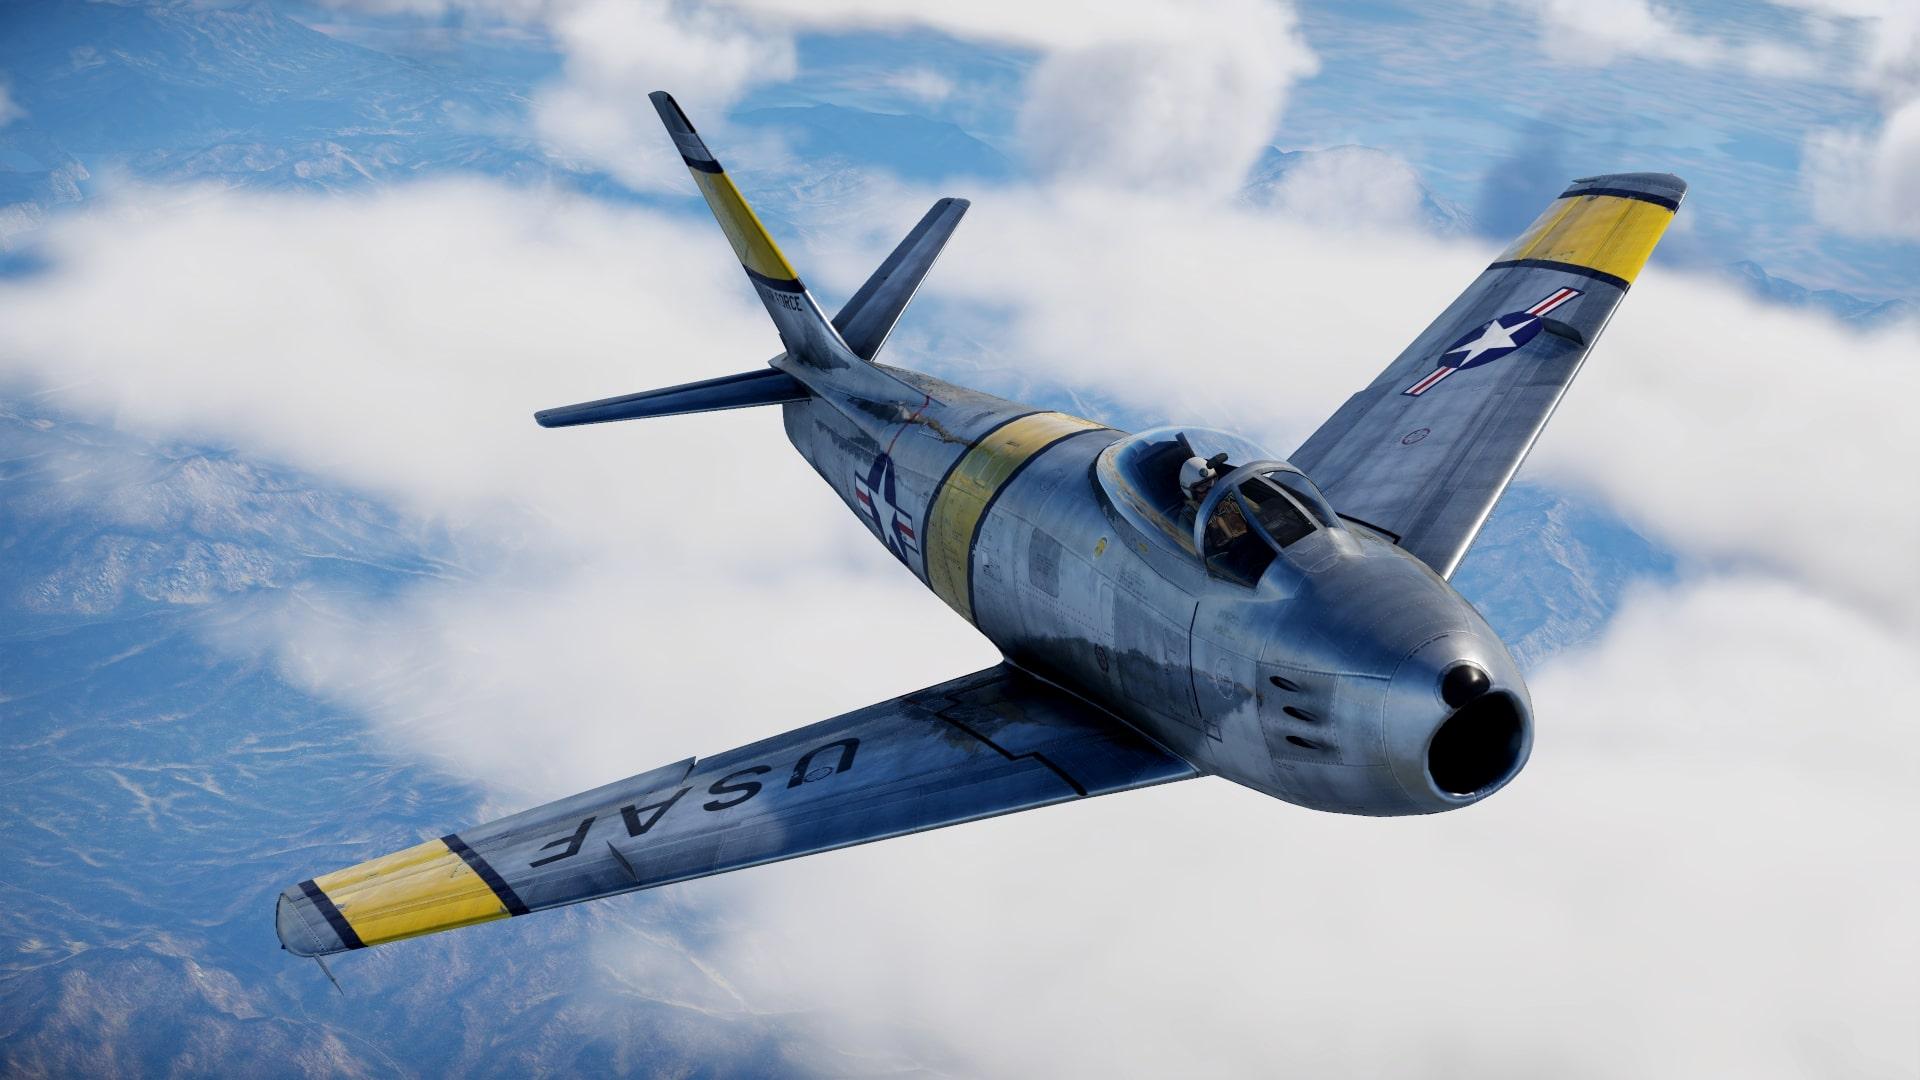 War Thunder Screenshot 2020.11.27 - 15.26.47.52.jpg